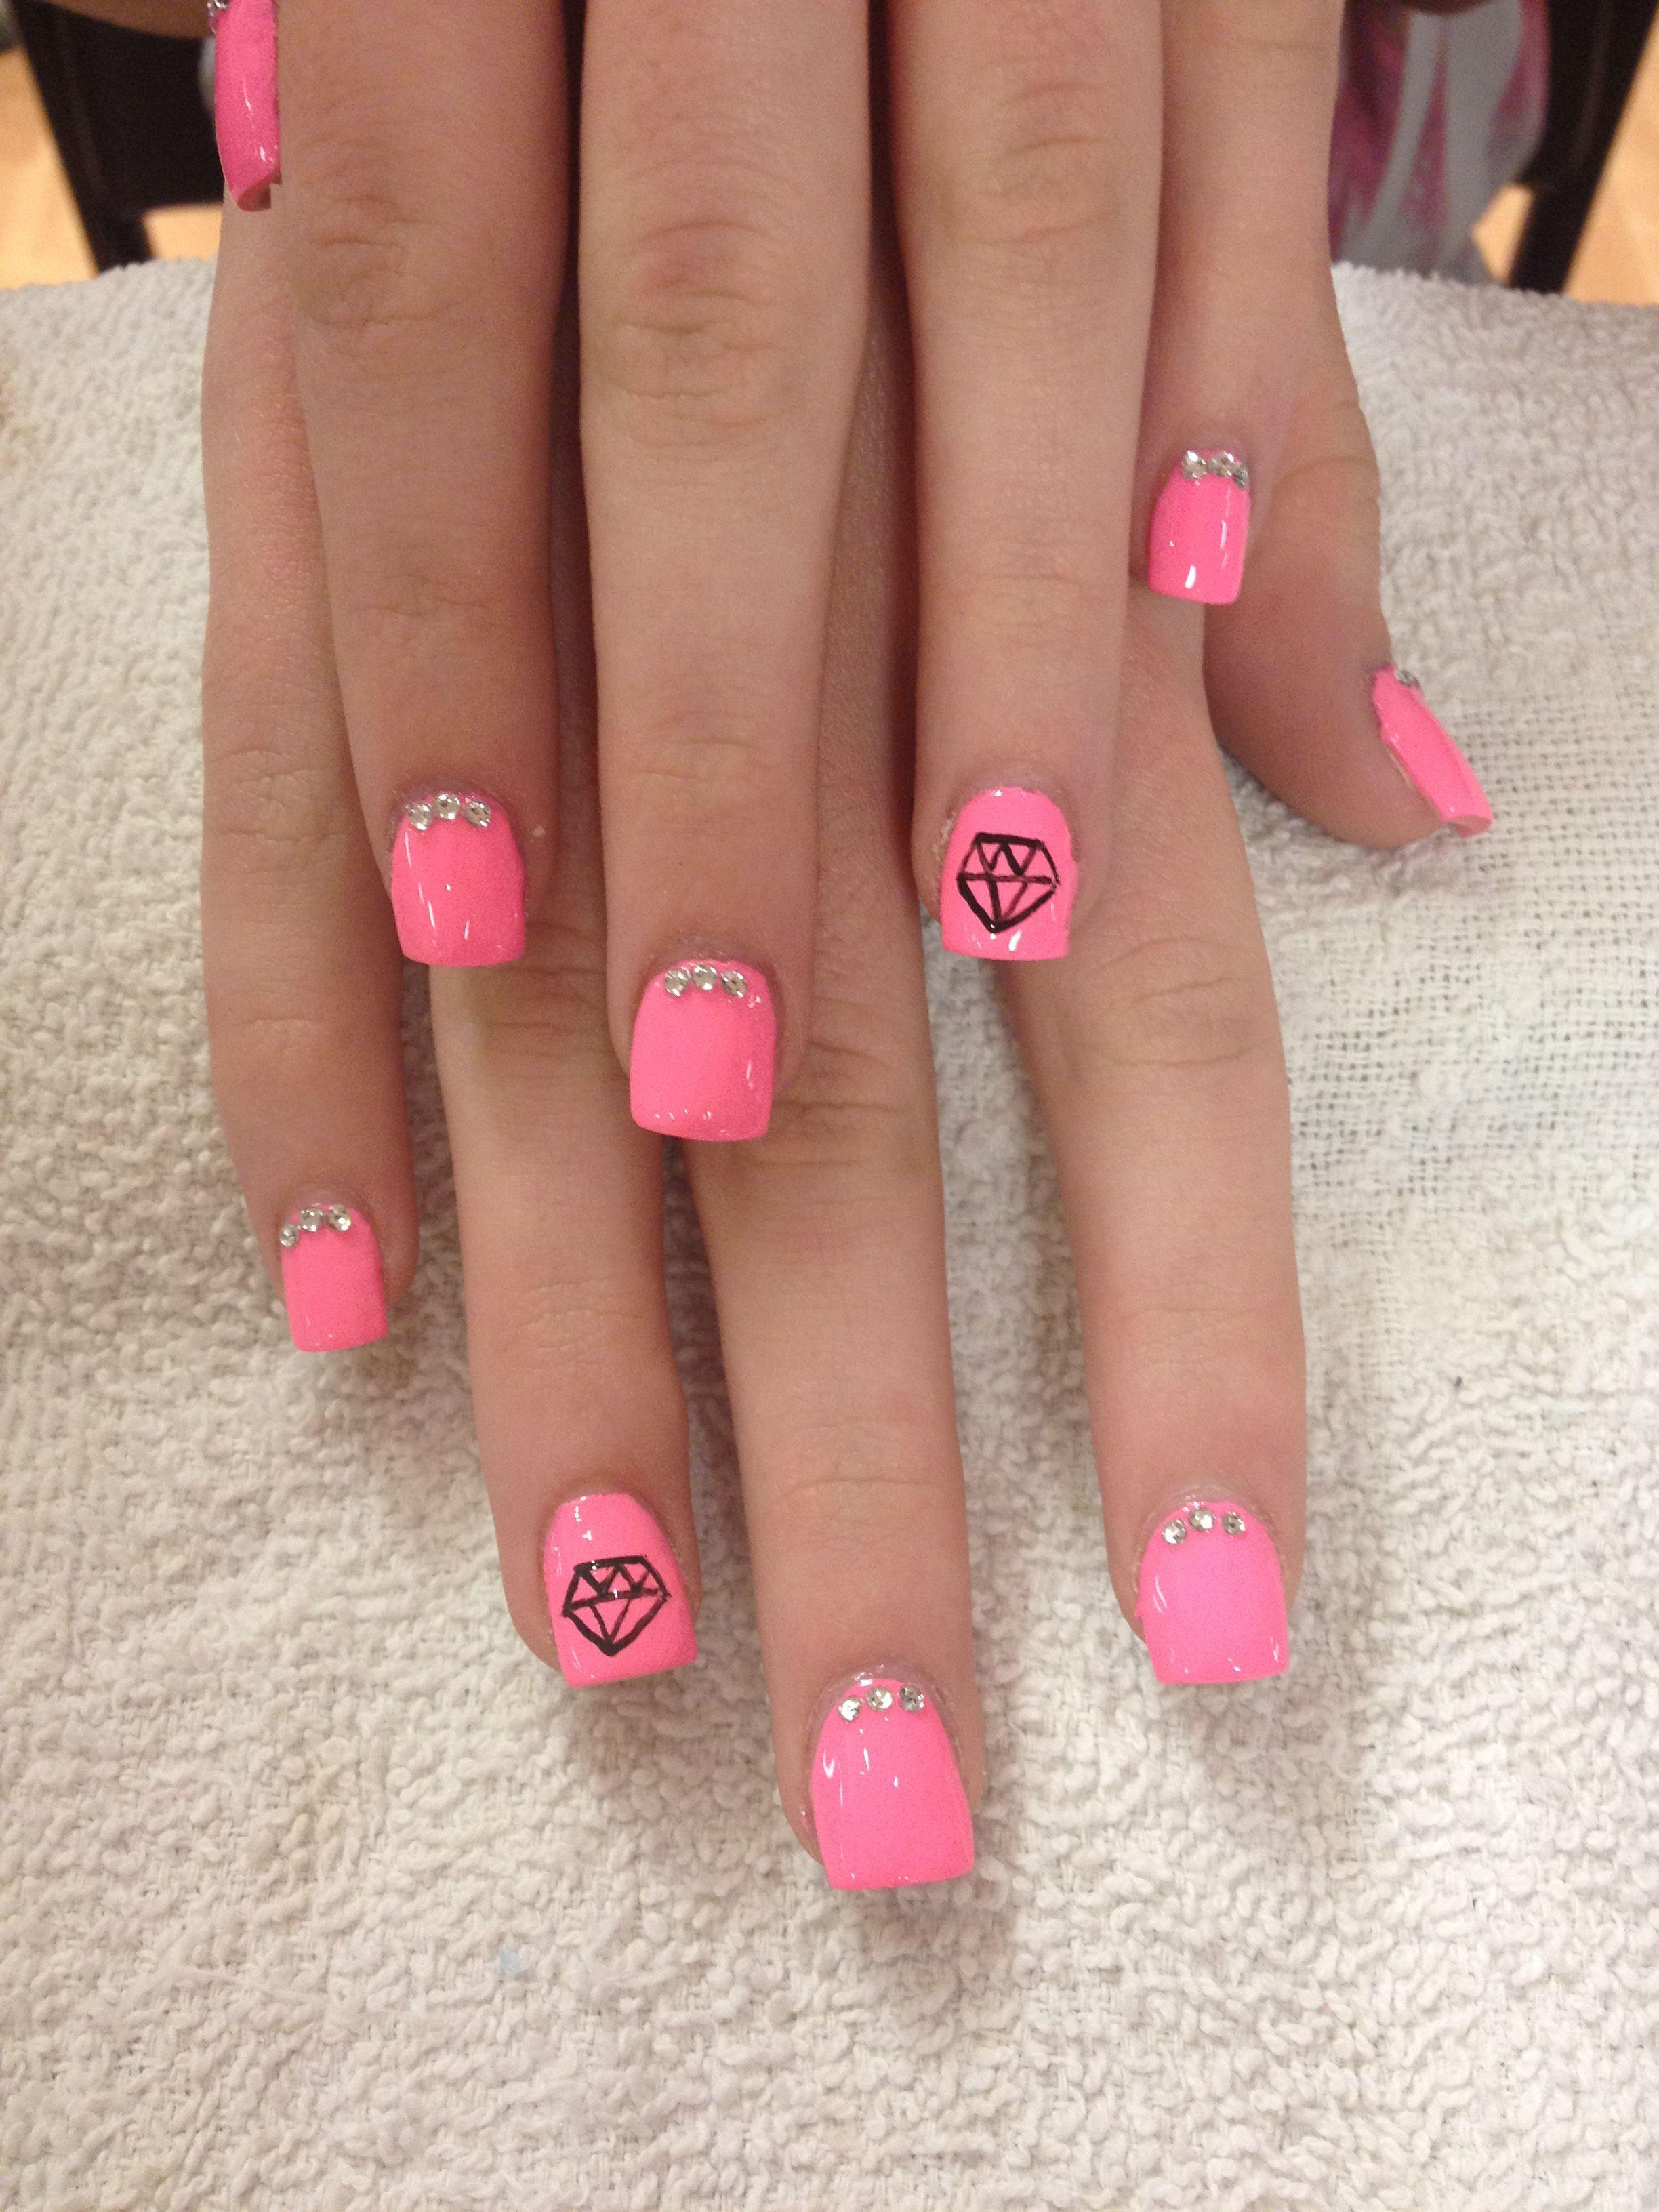 Diamond nails with gems | Nails | Pinterest | Diamond nails, Nail ...